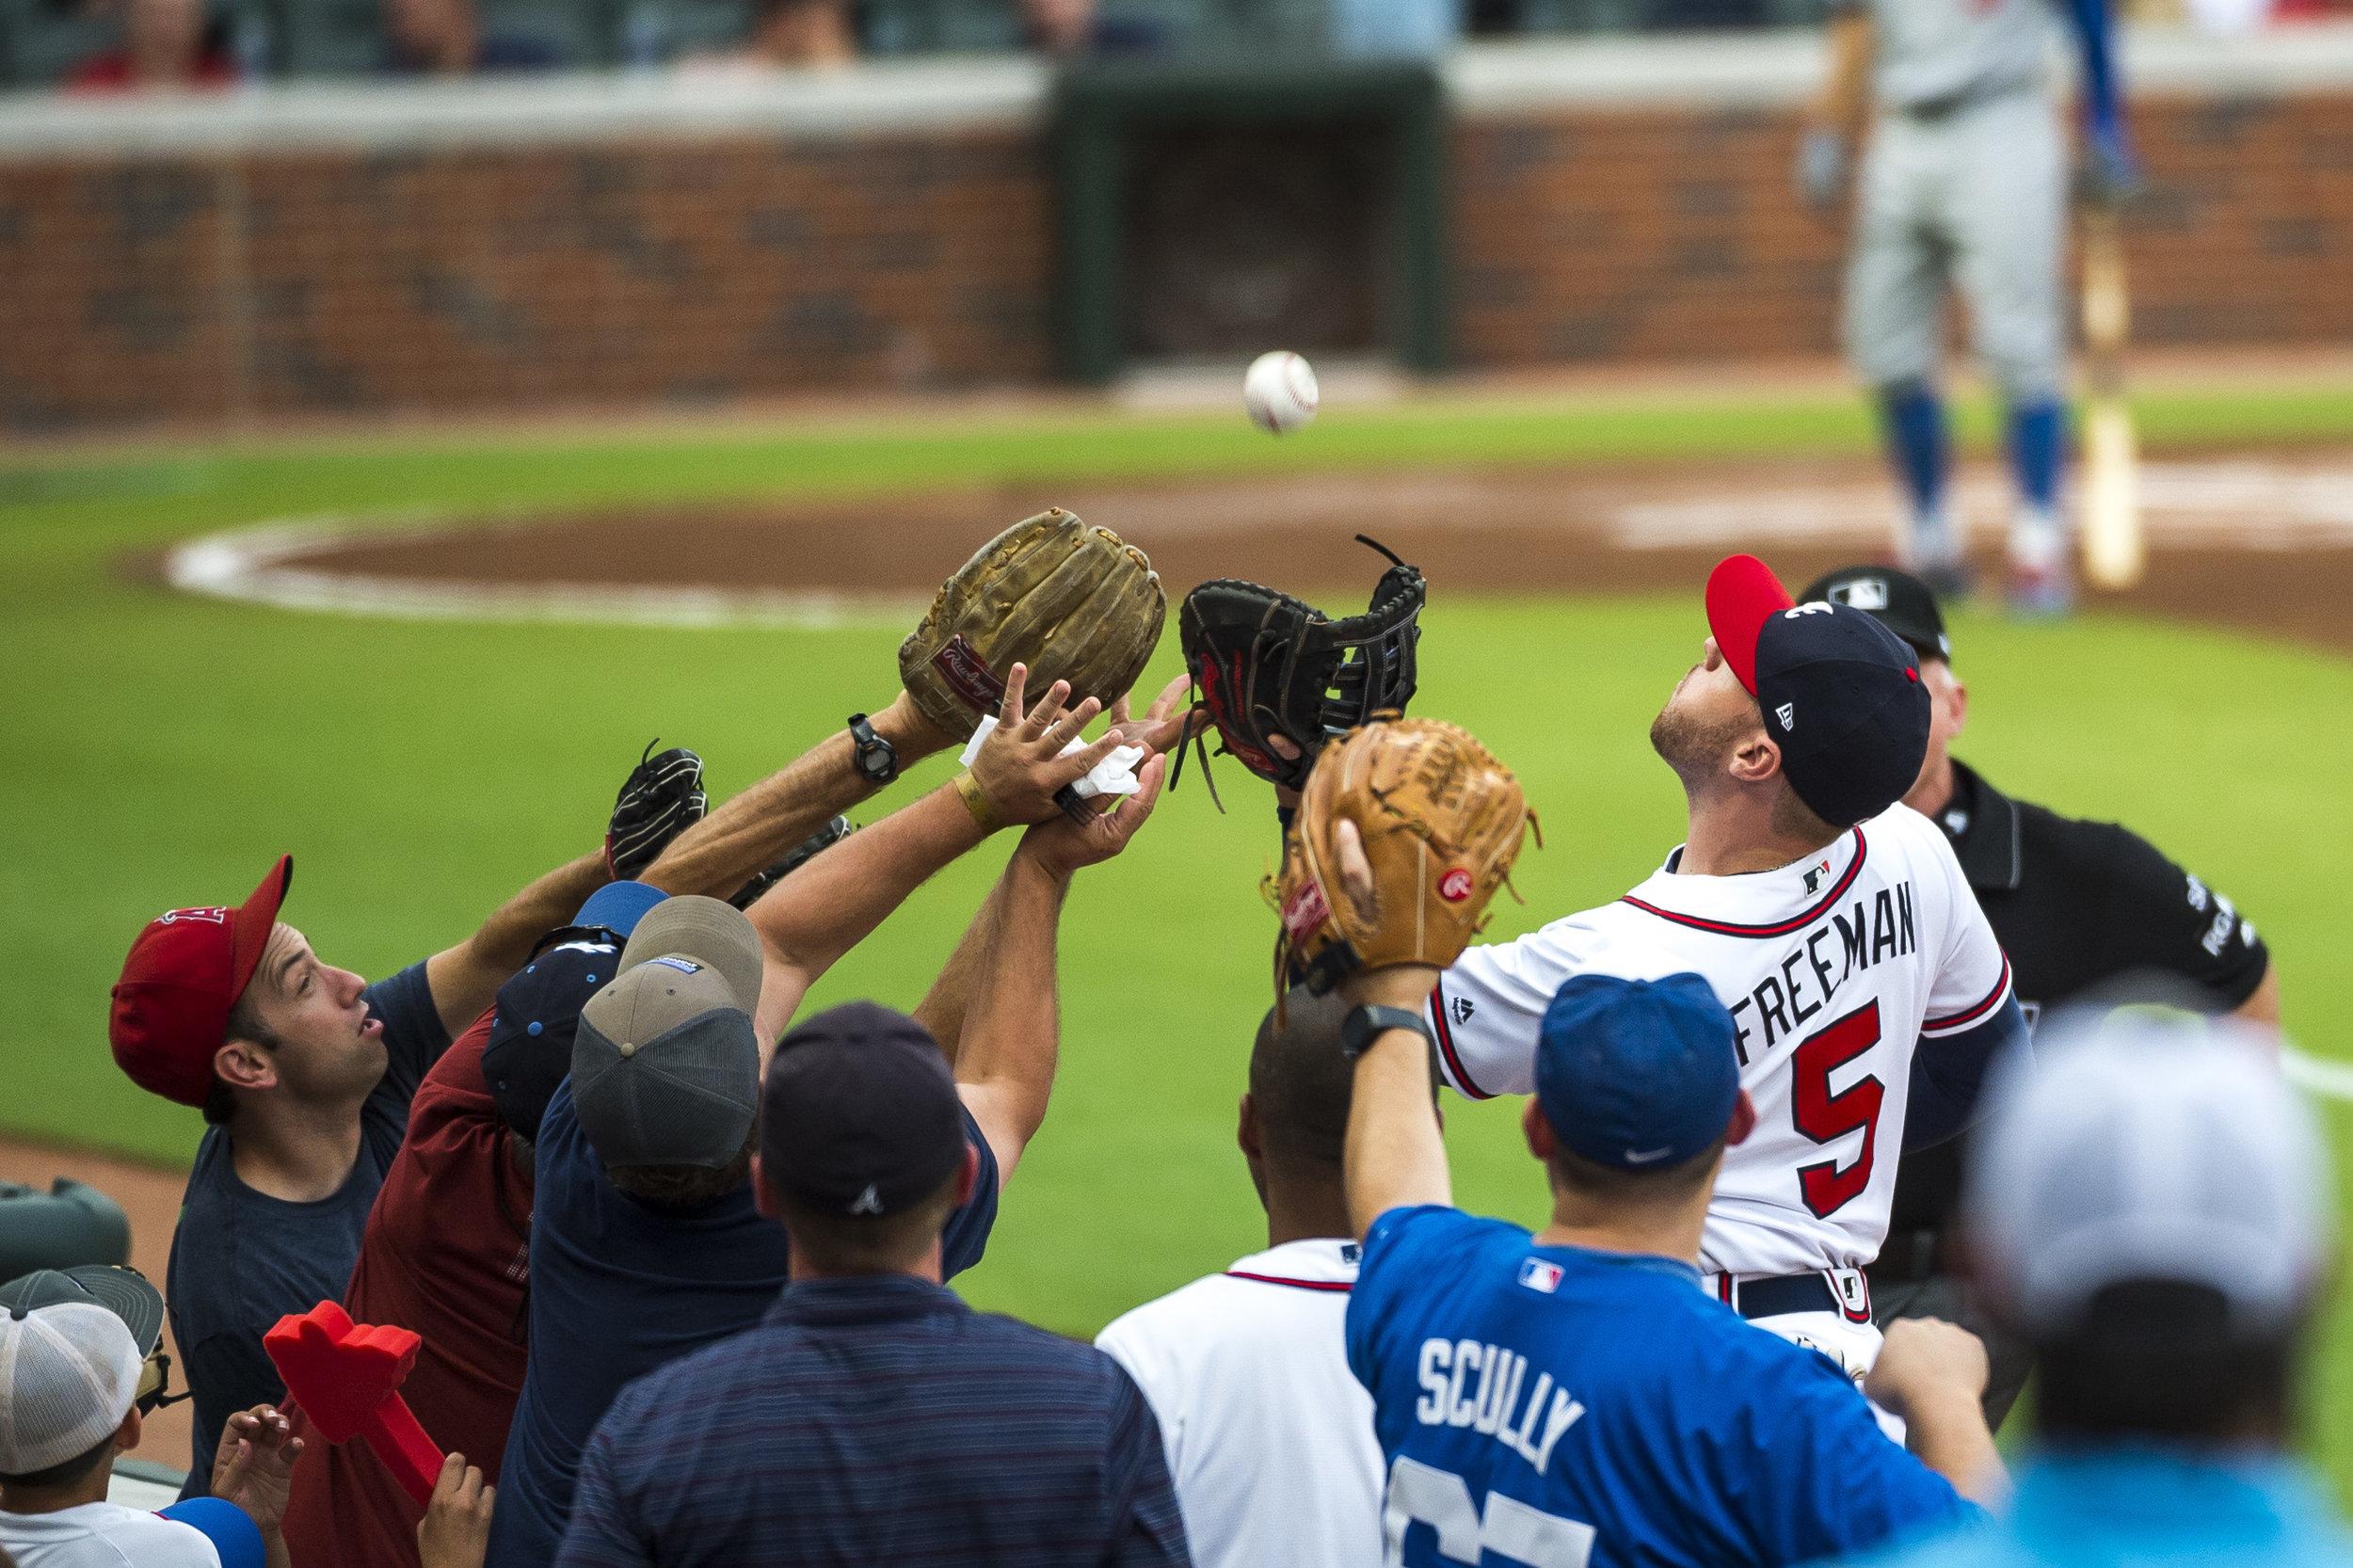 ATLANTA, GA - AUGUST 03: Freddie Freeman #5 of the Atlanta Braves fields a ball from fans against the Los Angeles Dodgers at SunTrust Park on August 3, 2017 in Atlanta, Georgia.